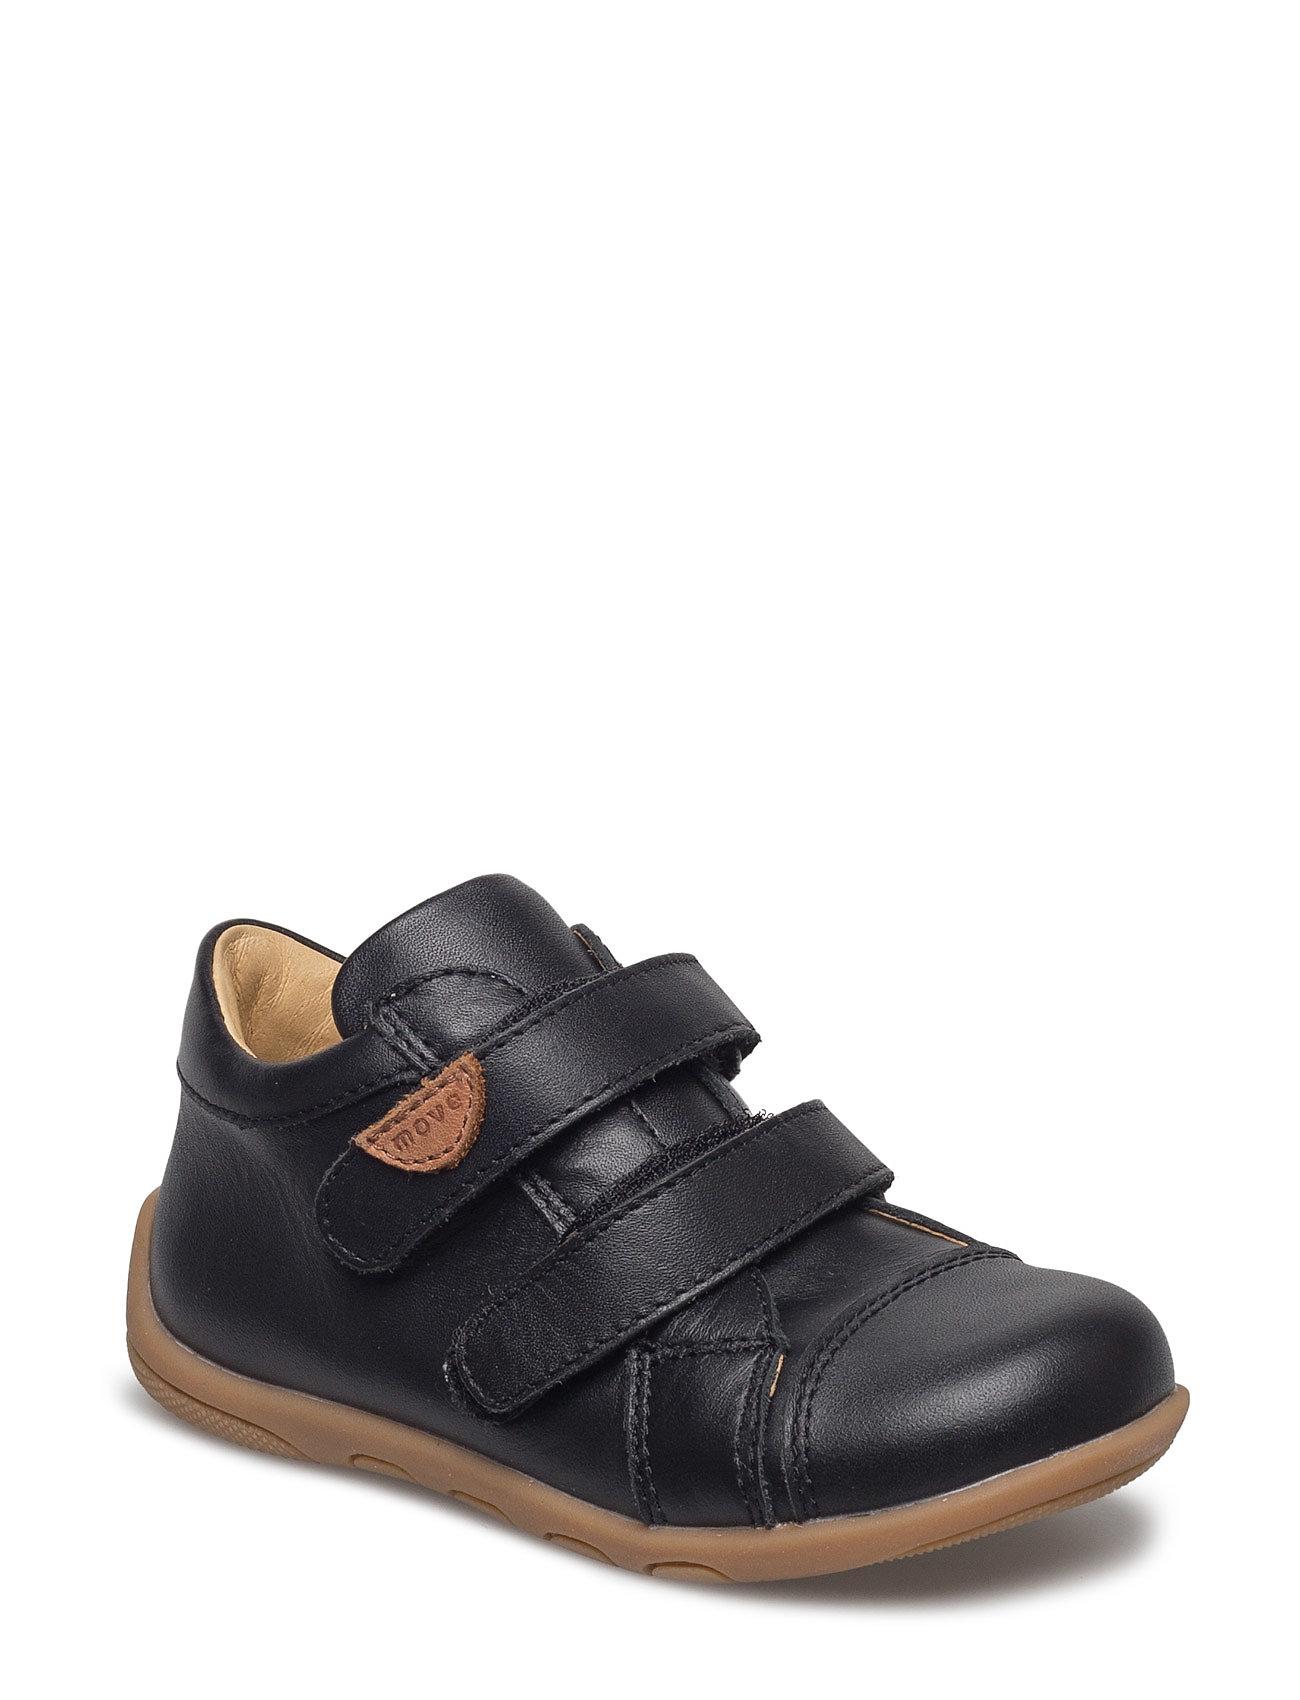 Infant Unisex Velcro Shoe Move by Melton Sko & Sneakers til Børn i